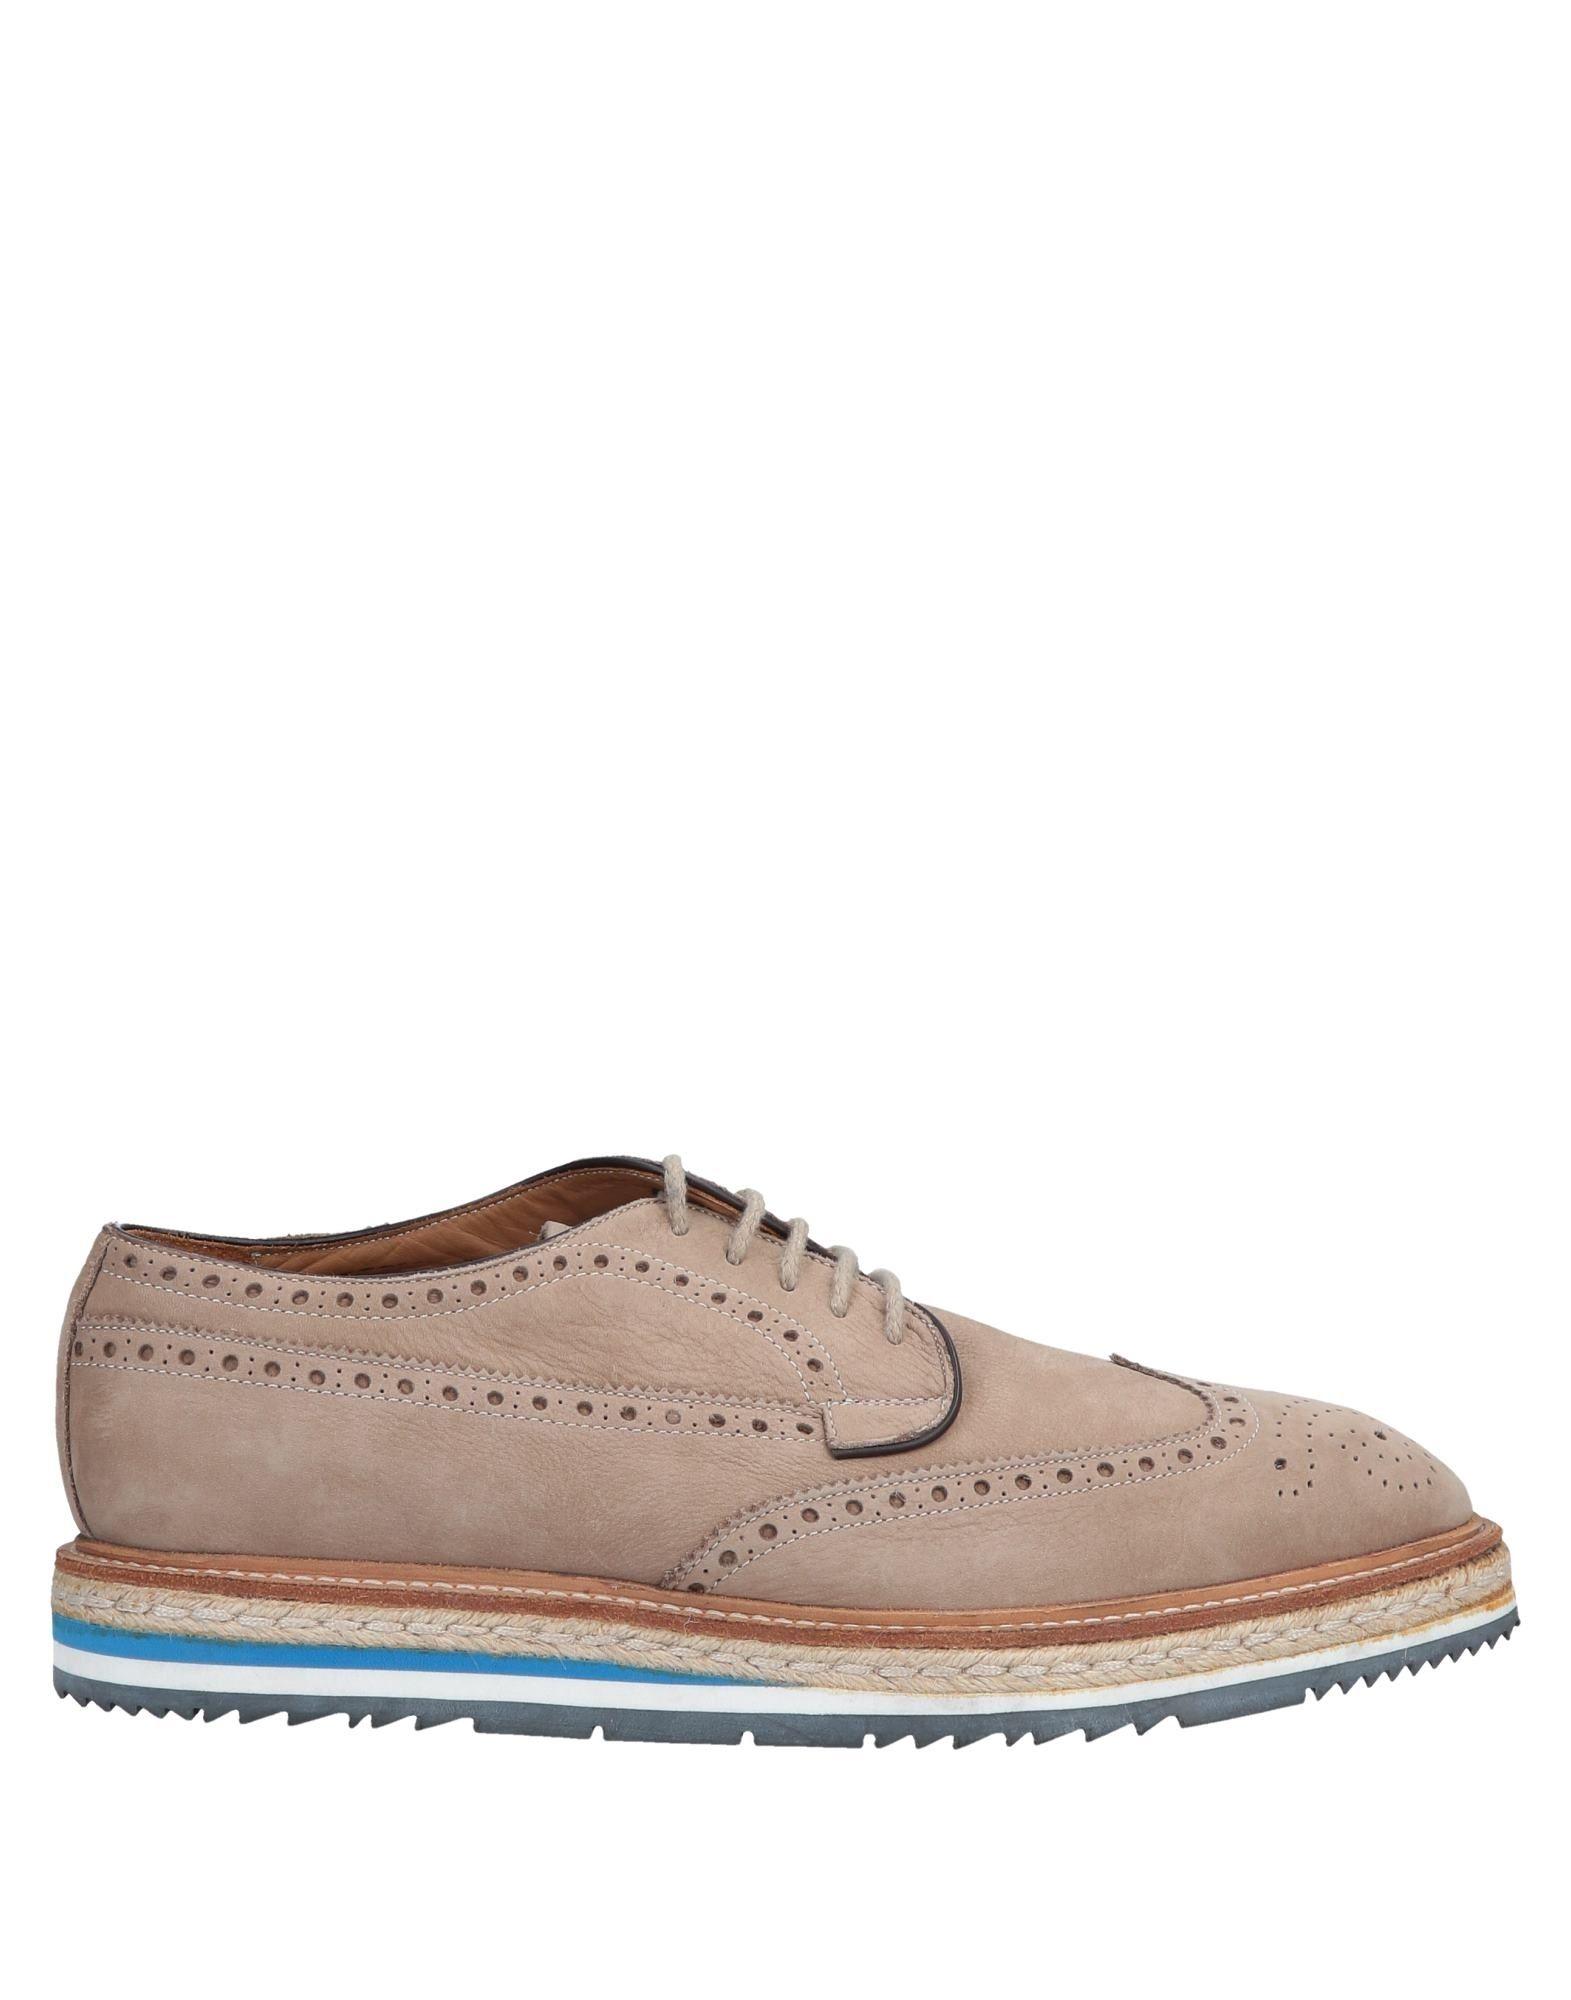 Фото - FRADI Обувь на шнурках обувь на высокой платформе dkny